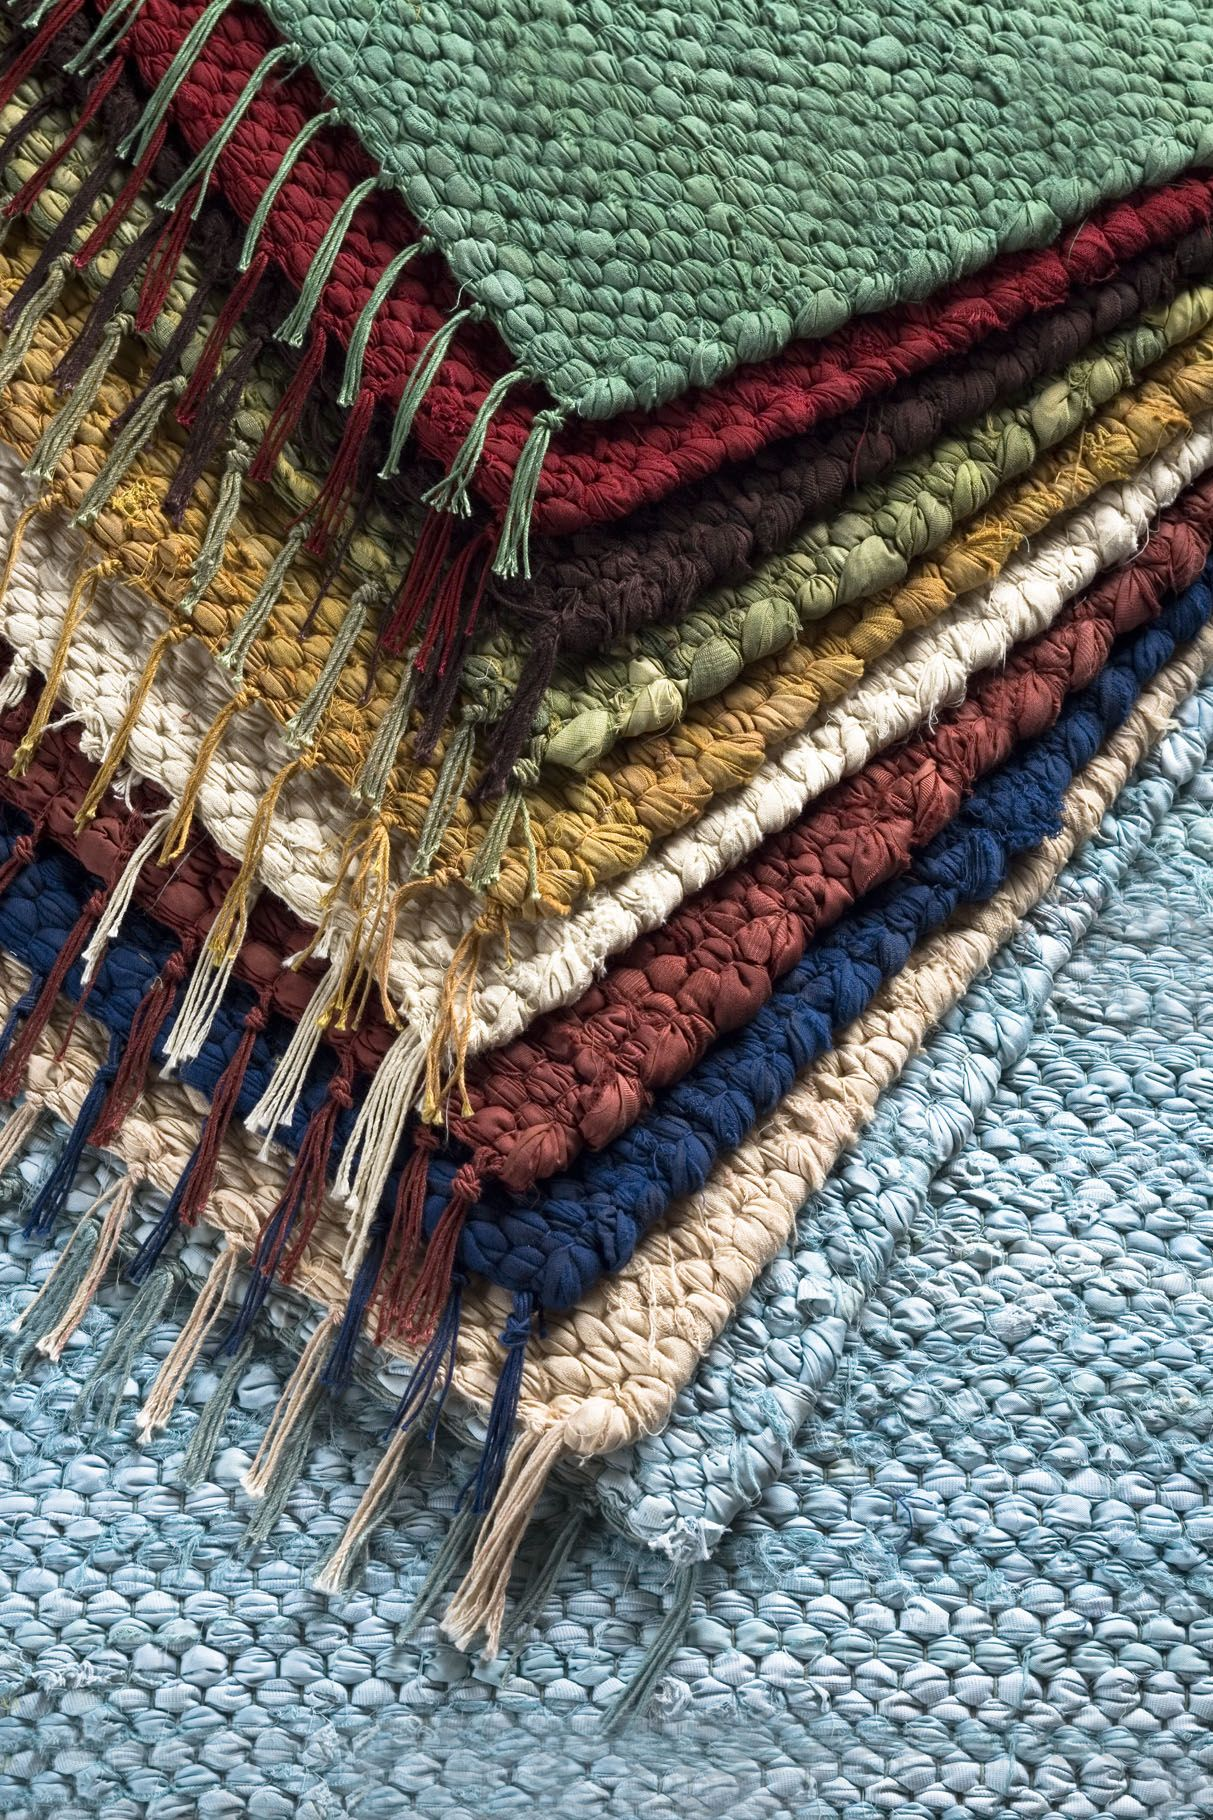 2 X 3 ft Rag Rug Throw All Solid Colors Cotton rag rug